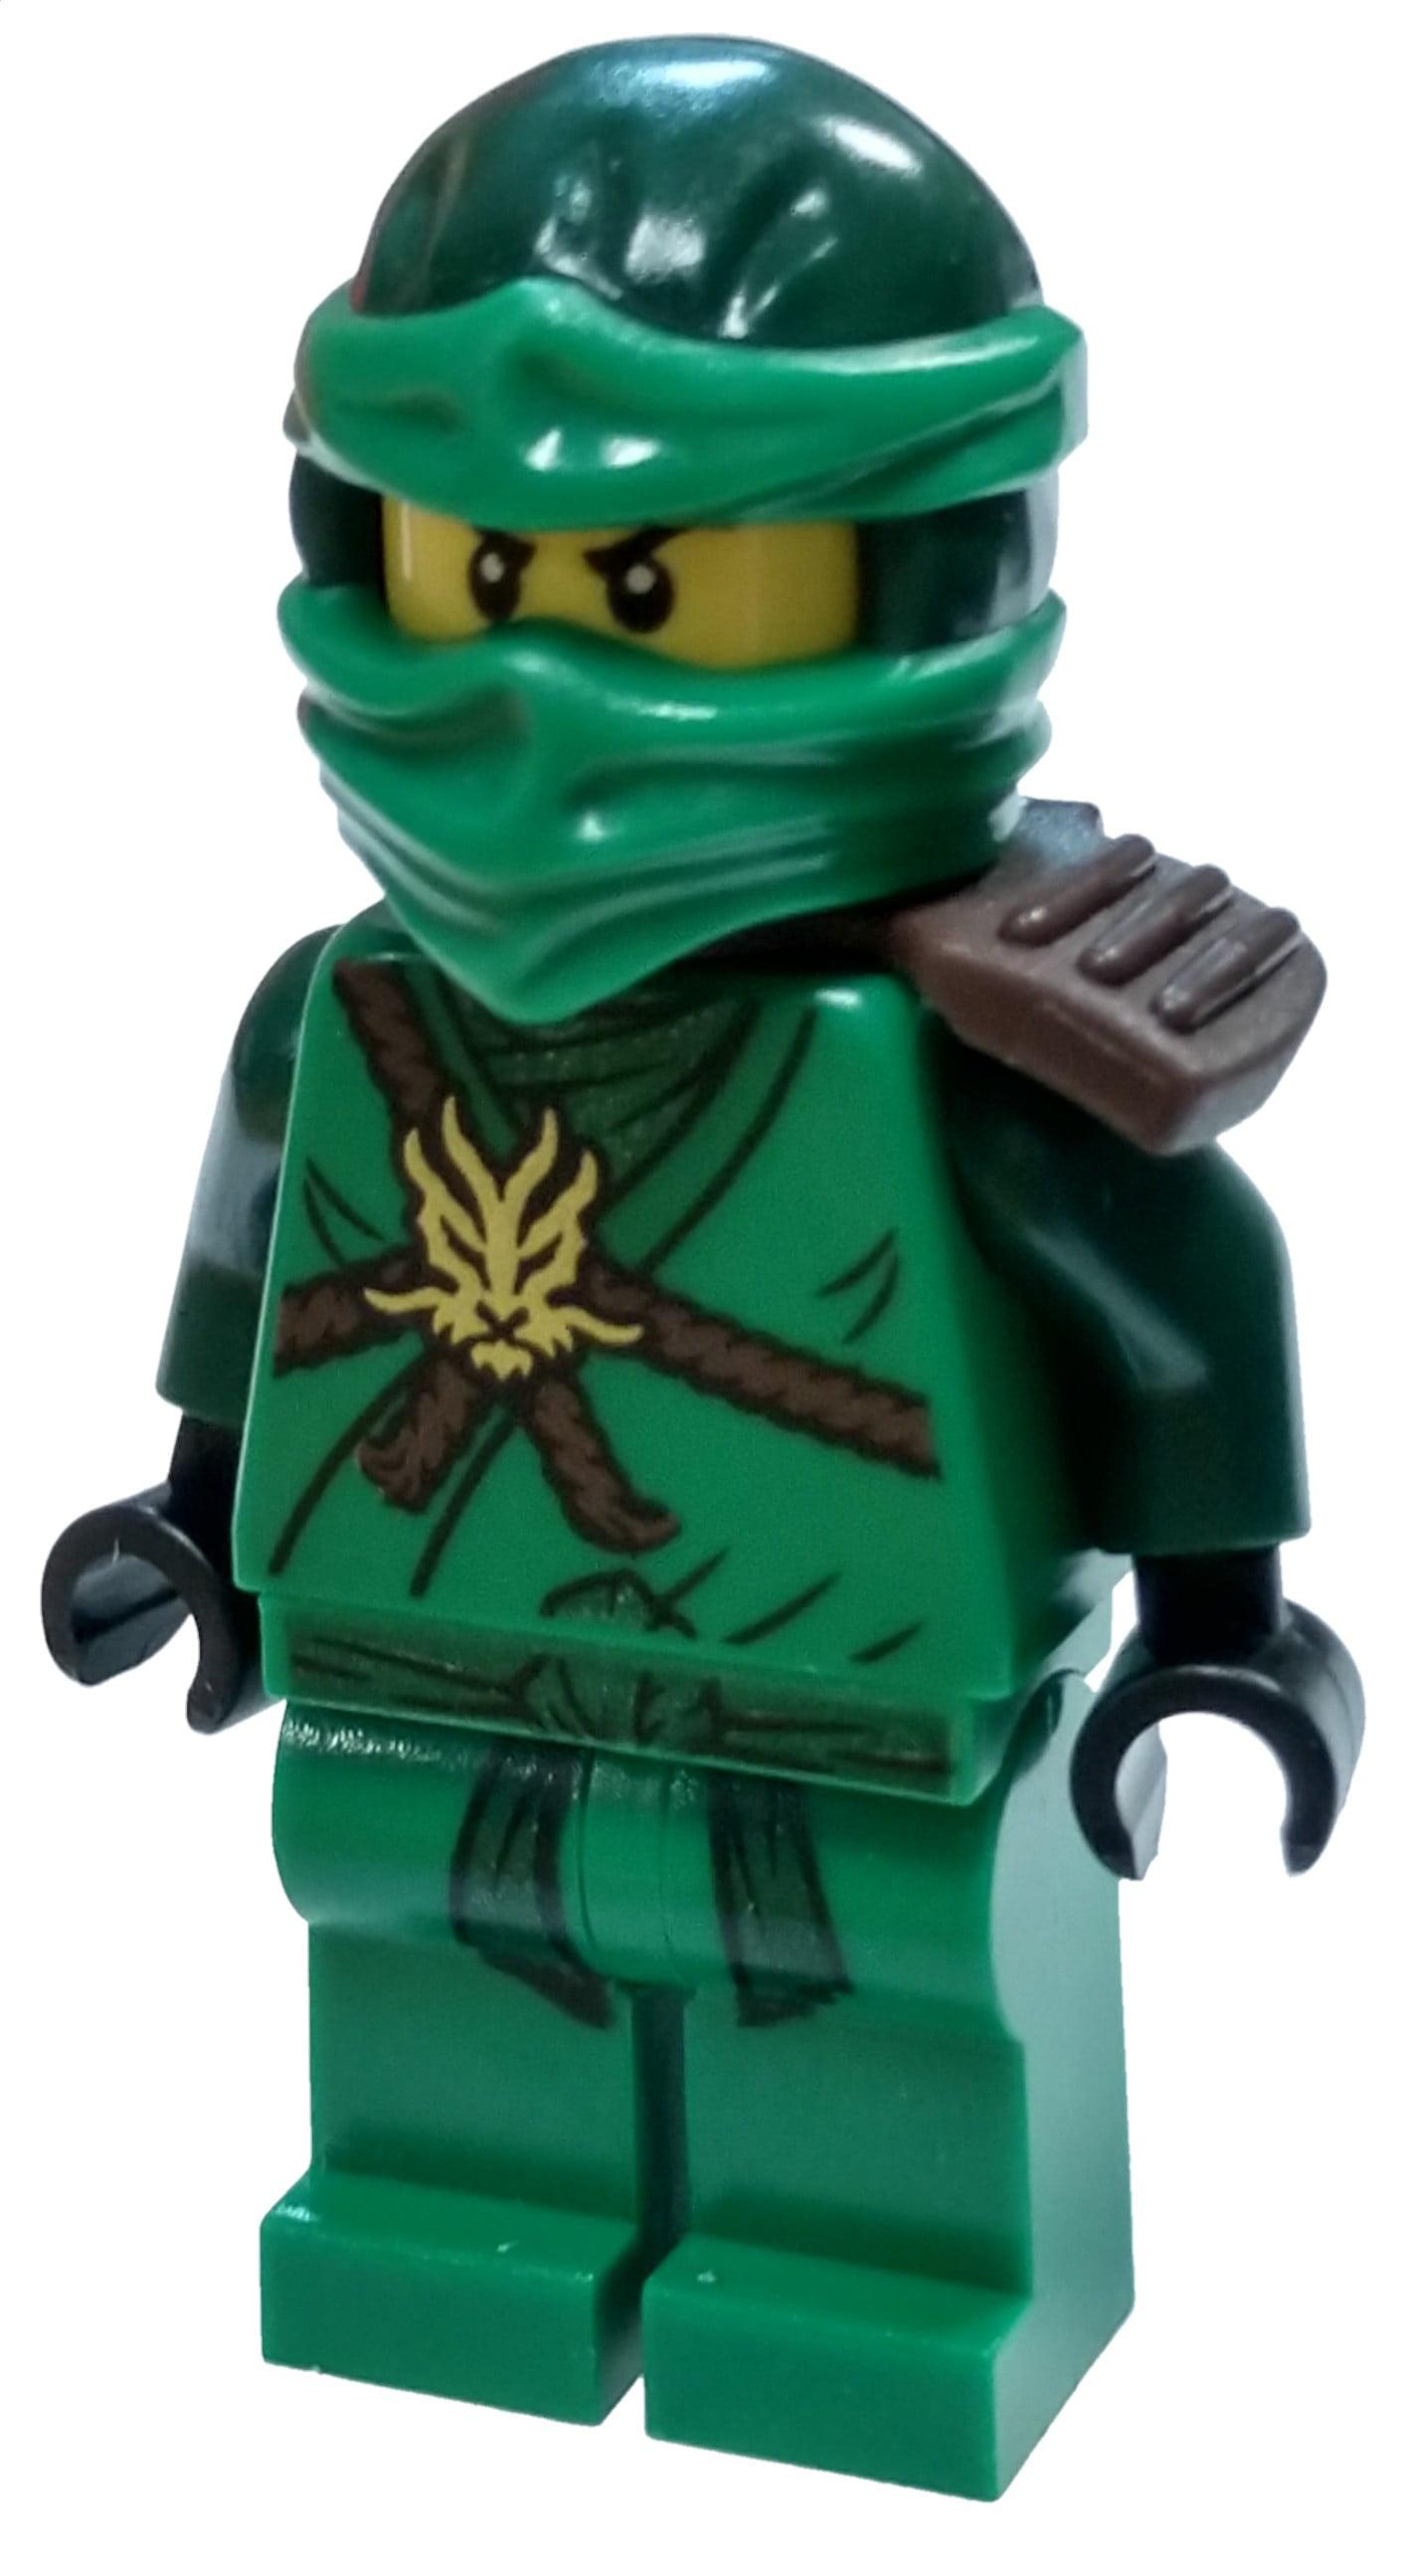 LEGO Ninjago Day of the Departed Lloyd Minifigure [No ...